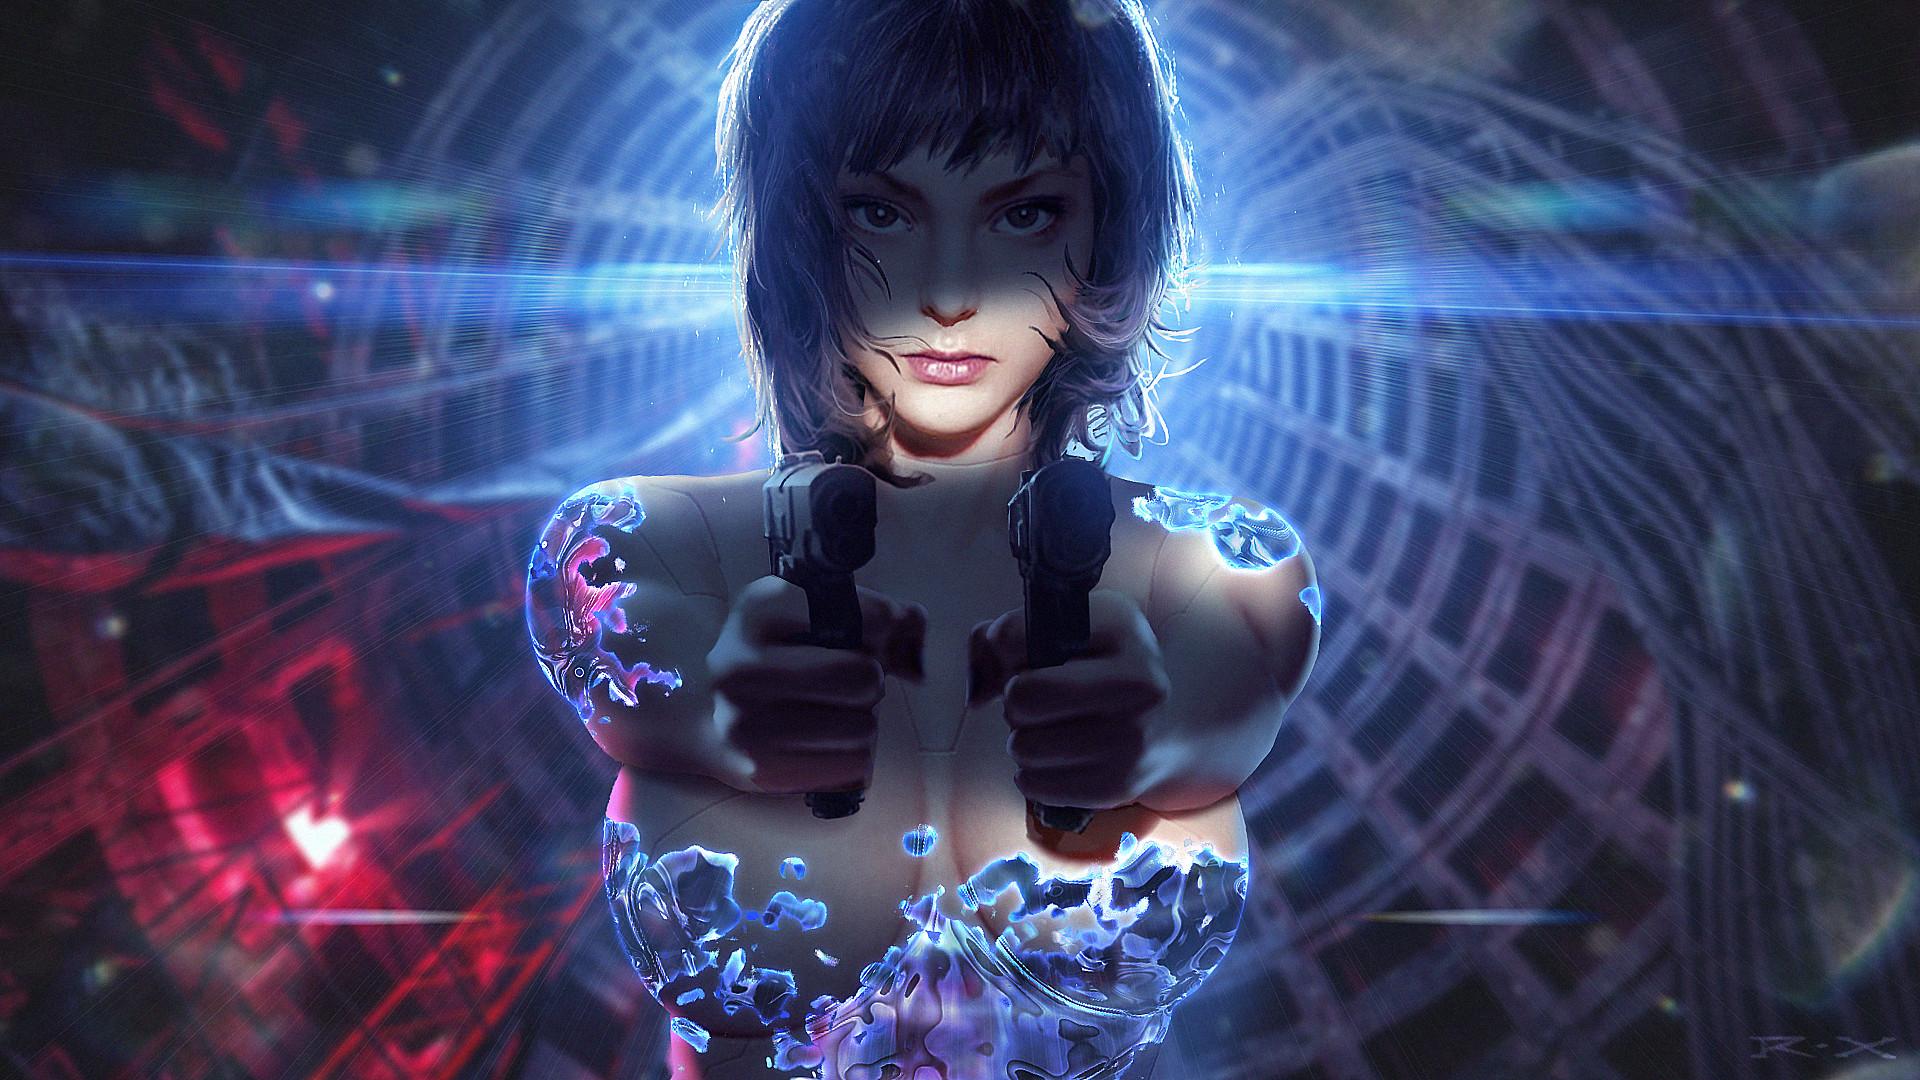 The Superb Digital Art of RX